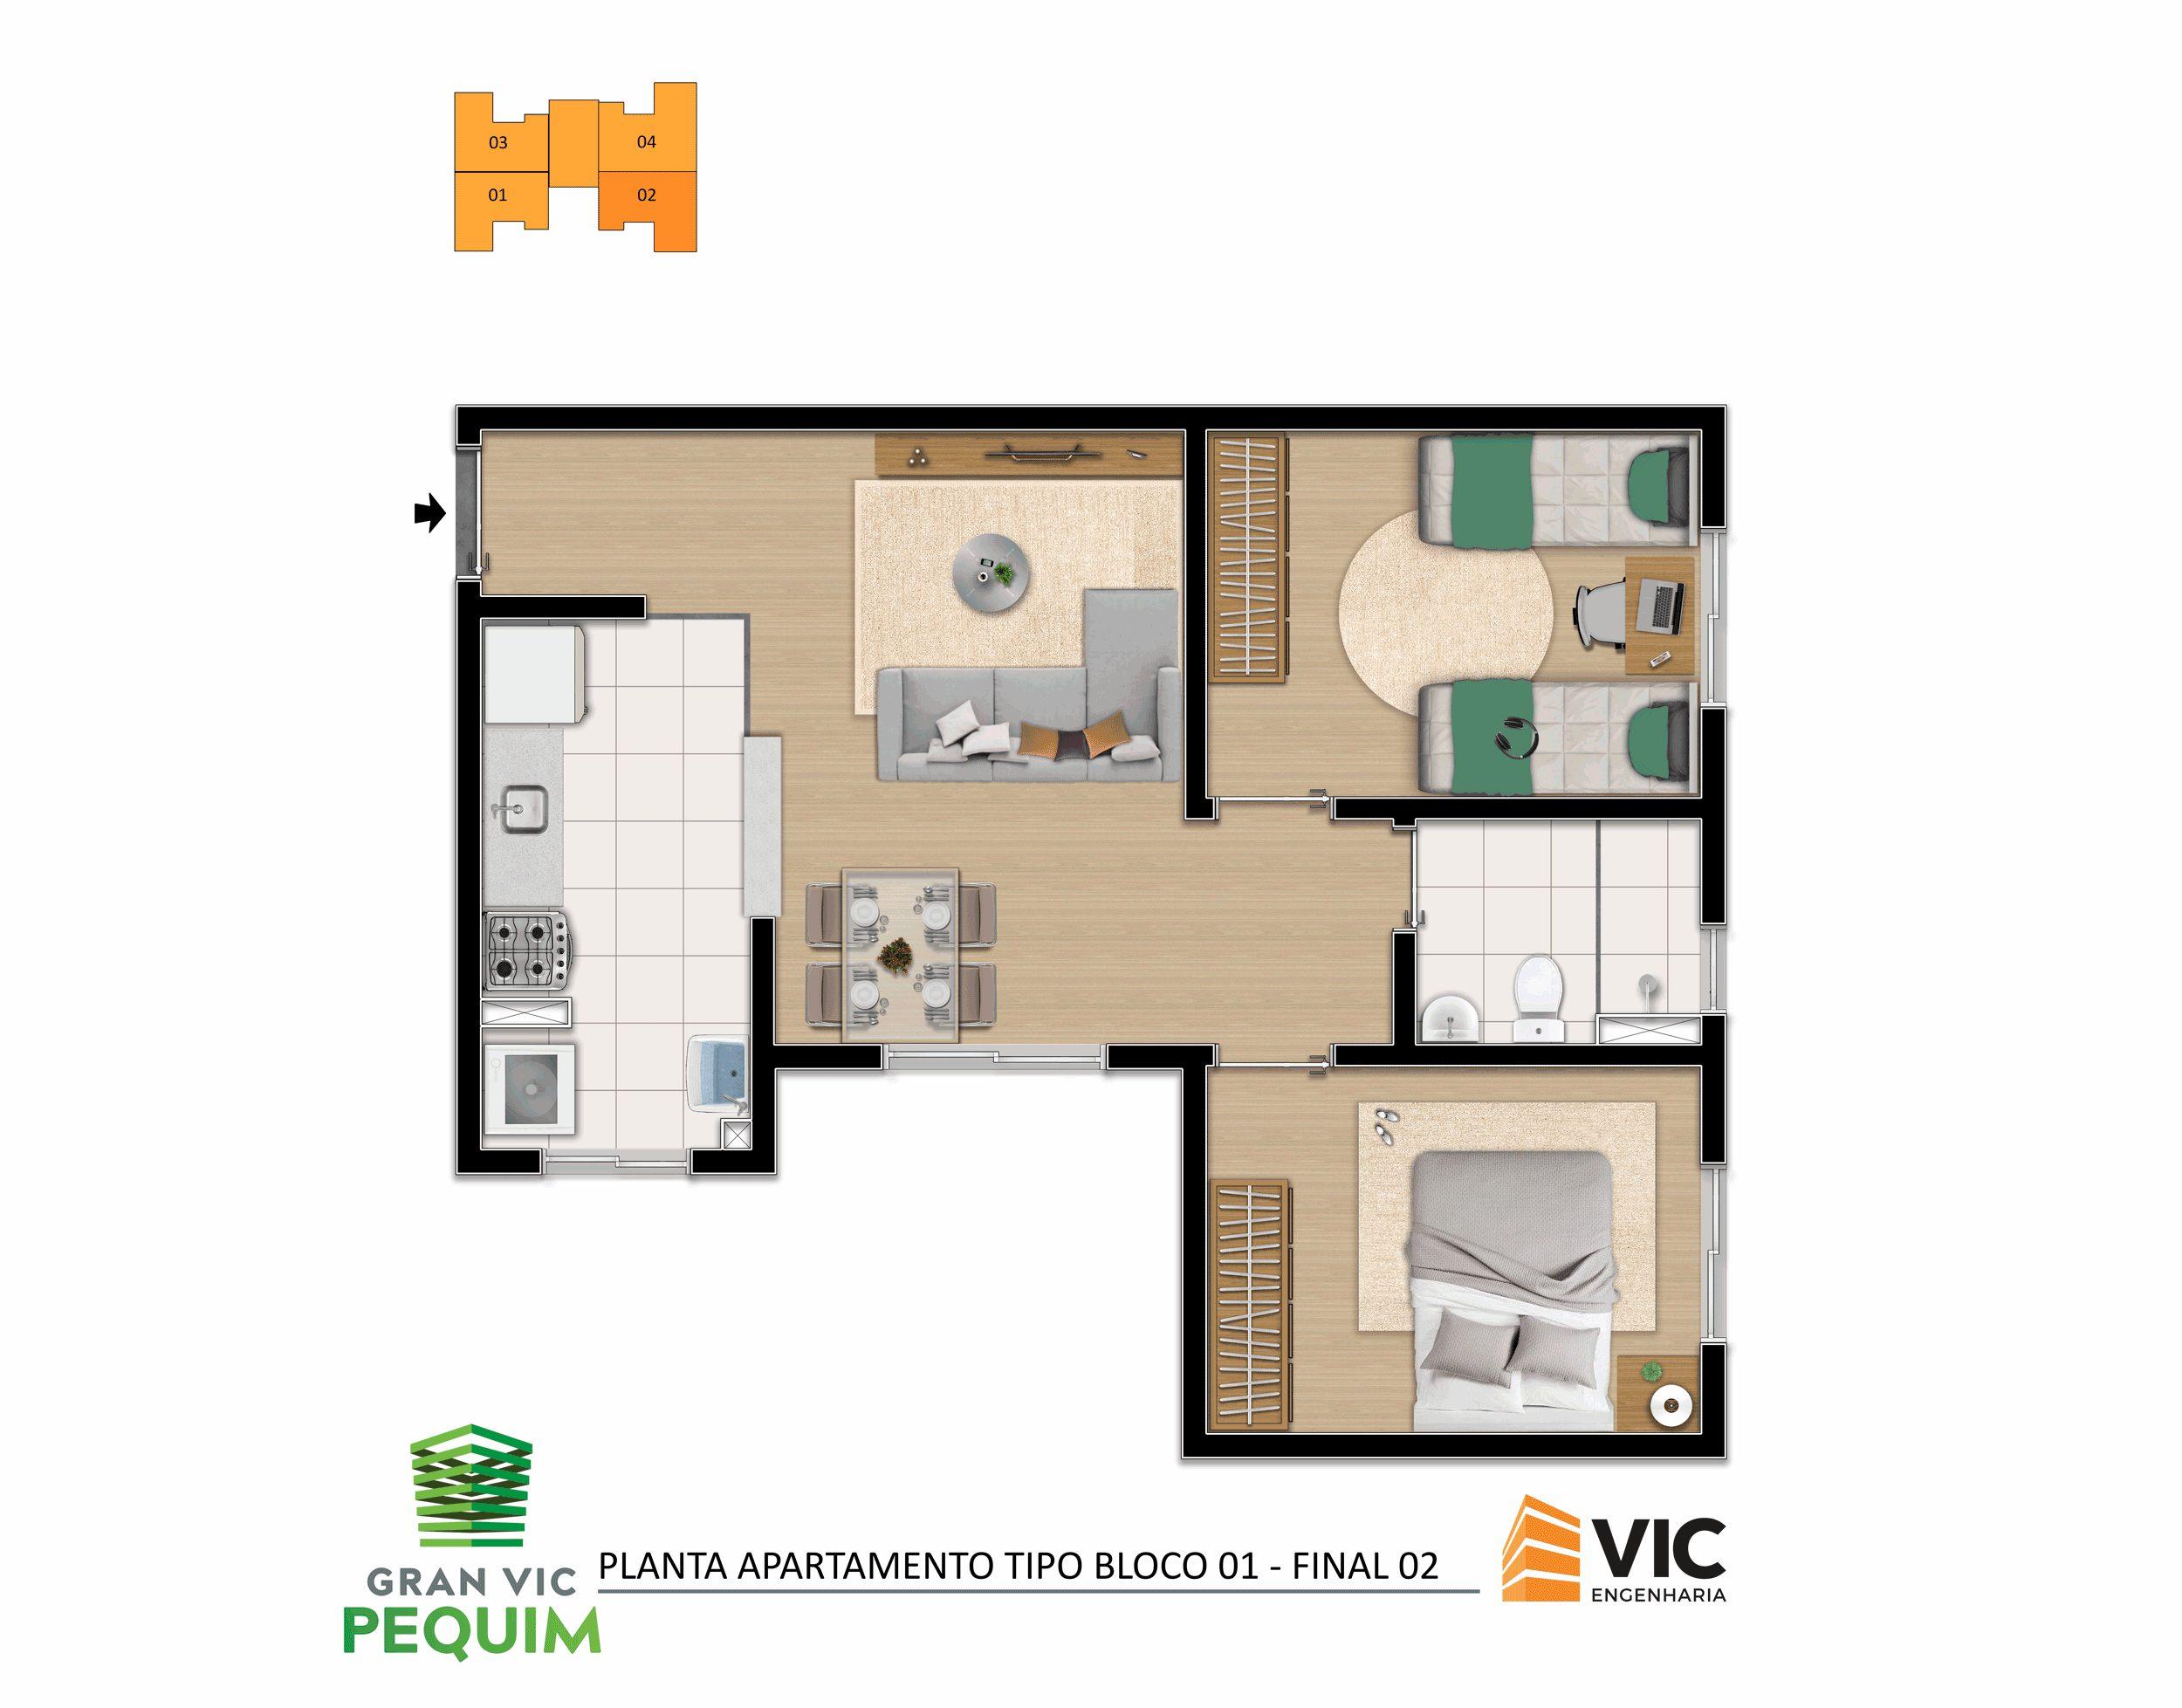 vic-engenharia-gran-vic-atenas-apartamento-tipo-torre-1-final-2